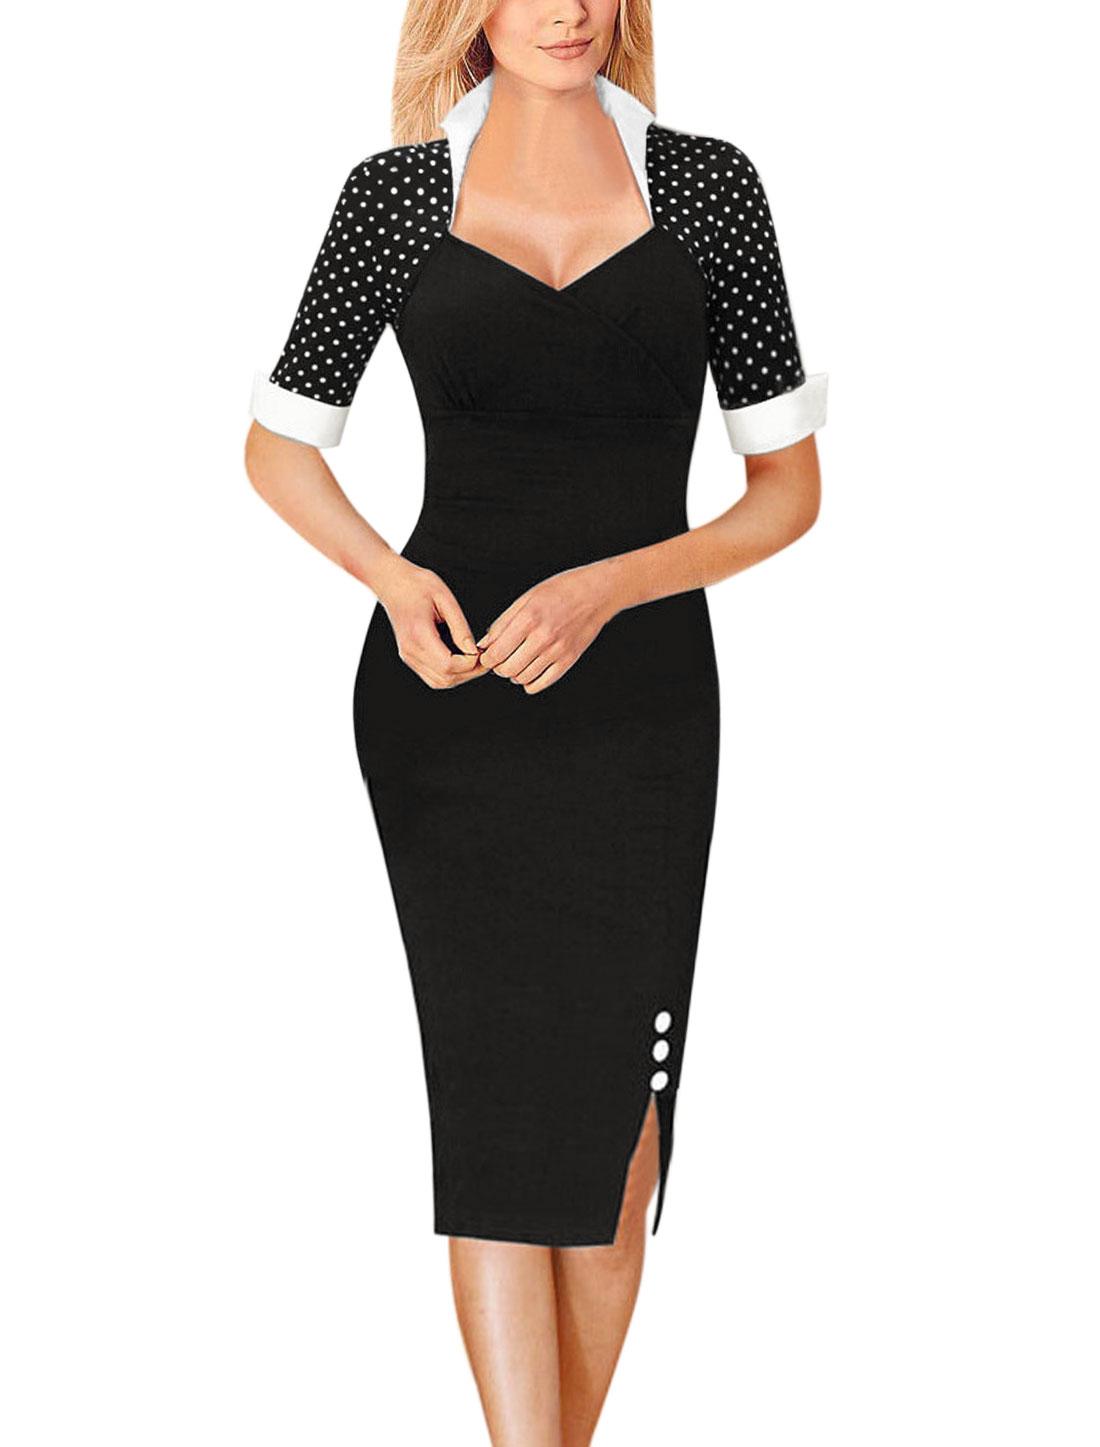 Women Stand Collar Polka Dots Bodycon Dress Black L